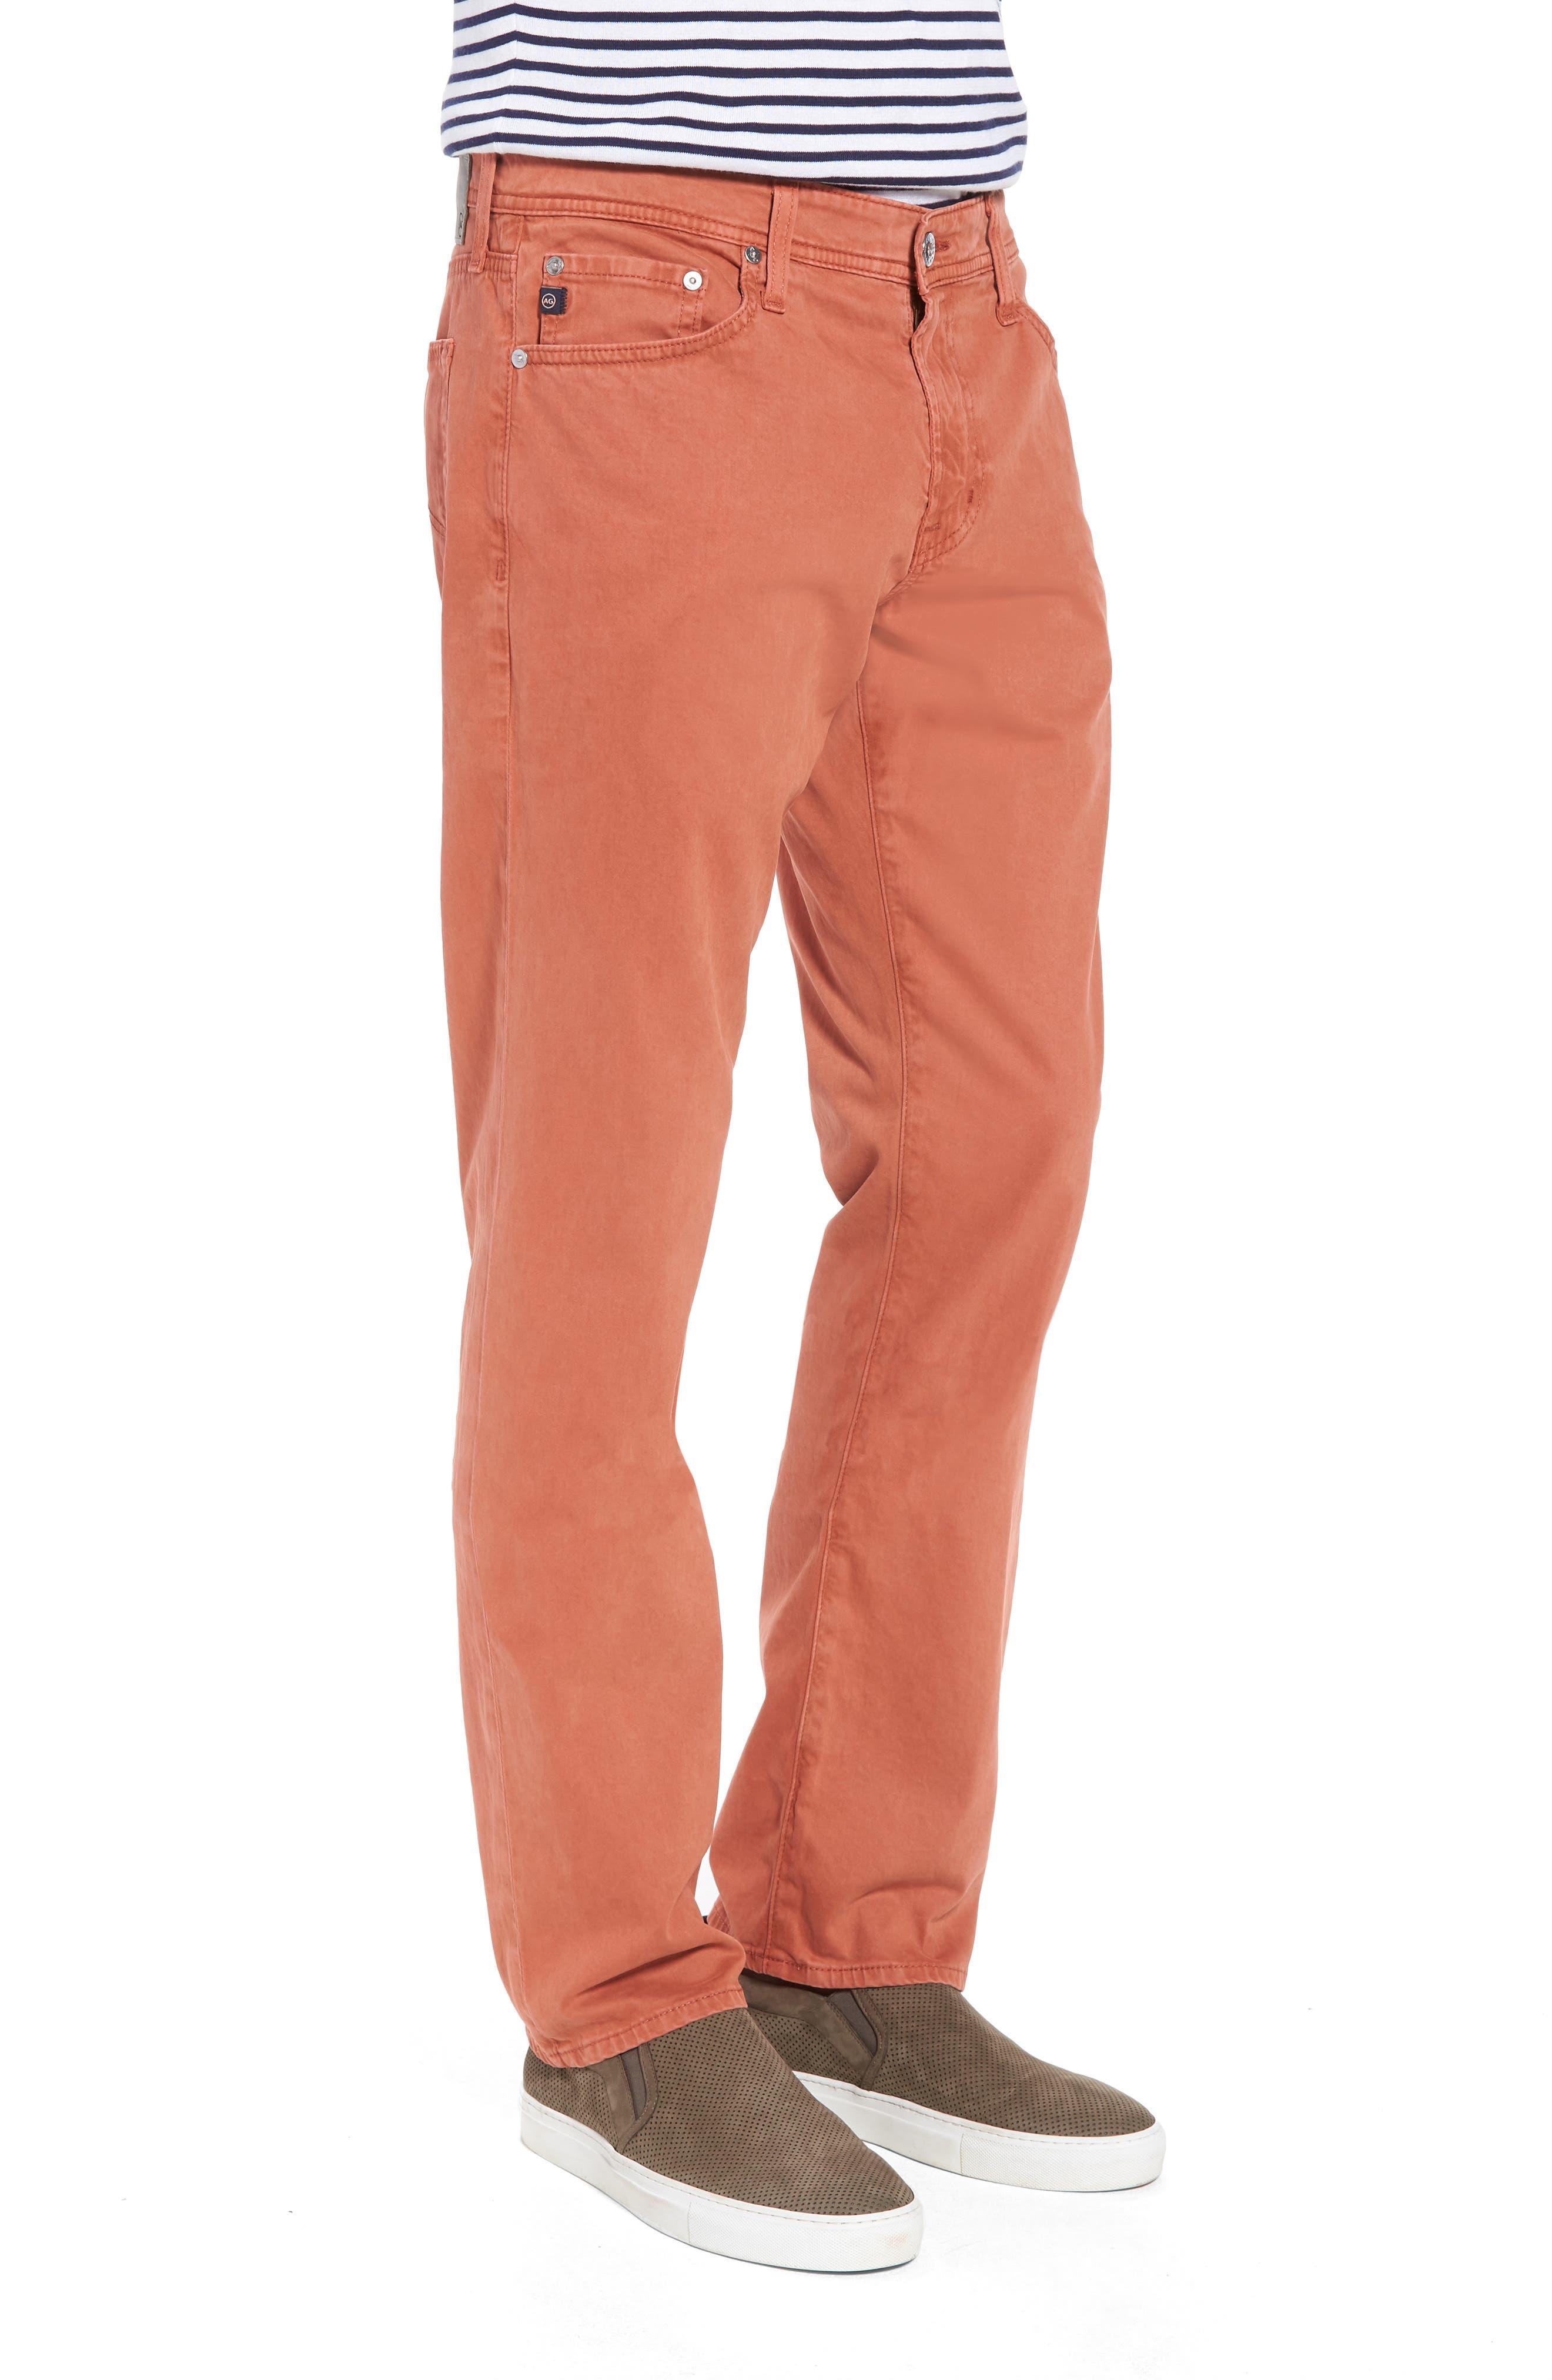 Graduate SUD Slim Straight Leg Pants,                             Alternate thumbnail 3, color,                             Sulfur Rosso Red